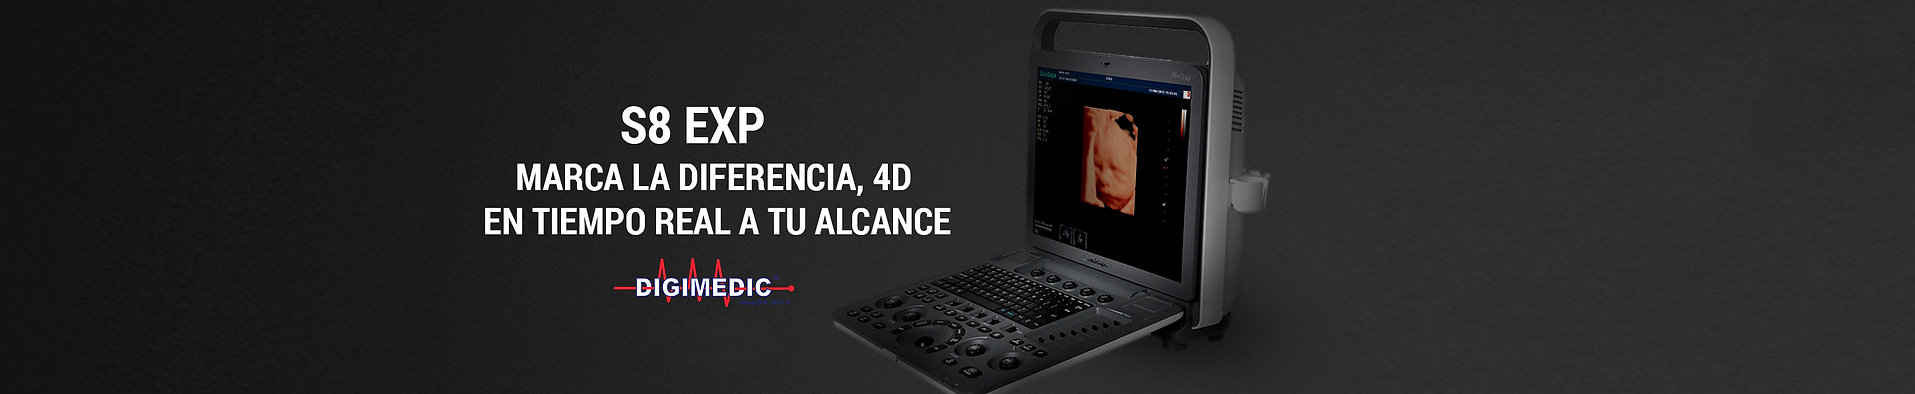 S8 EXP WEB WEB.jpg